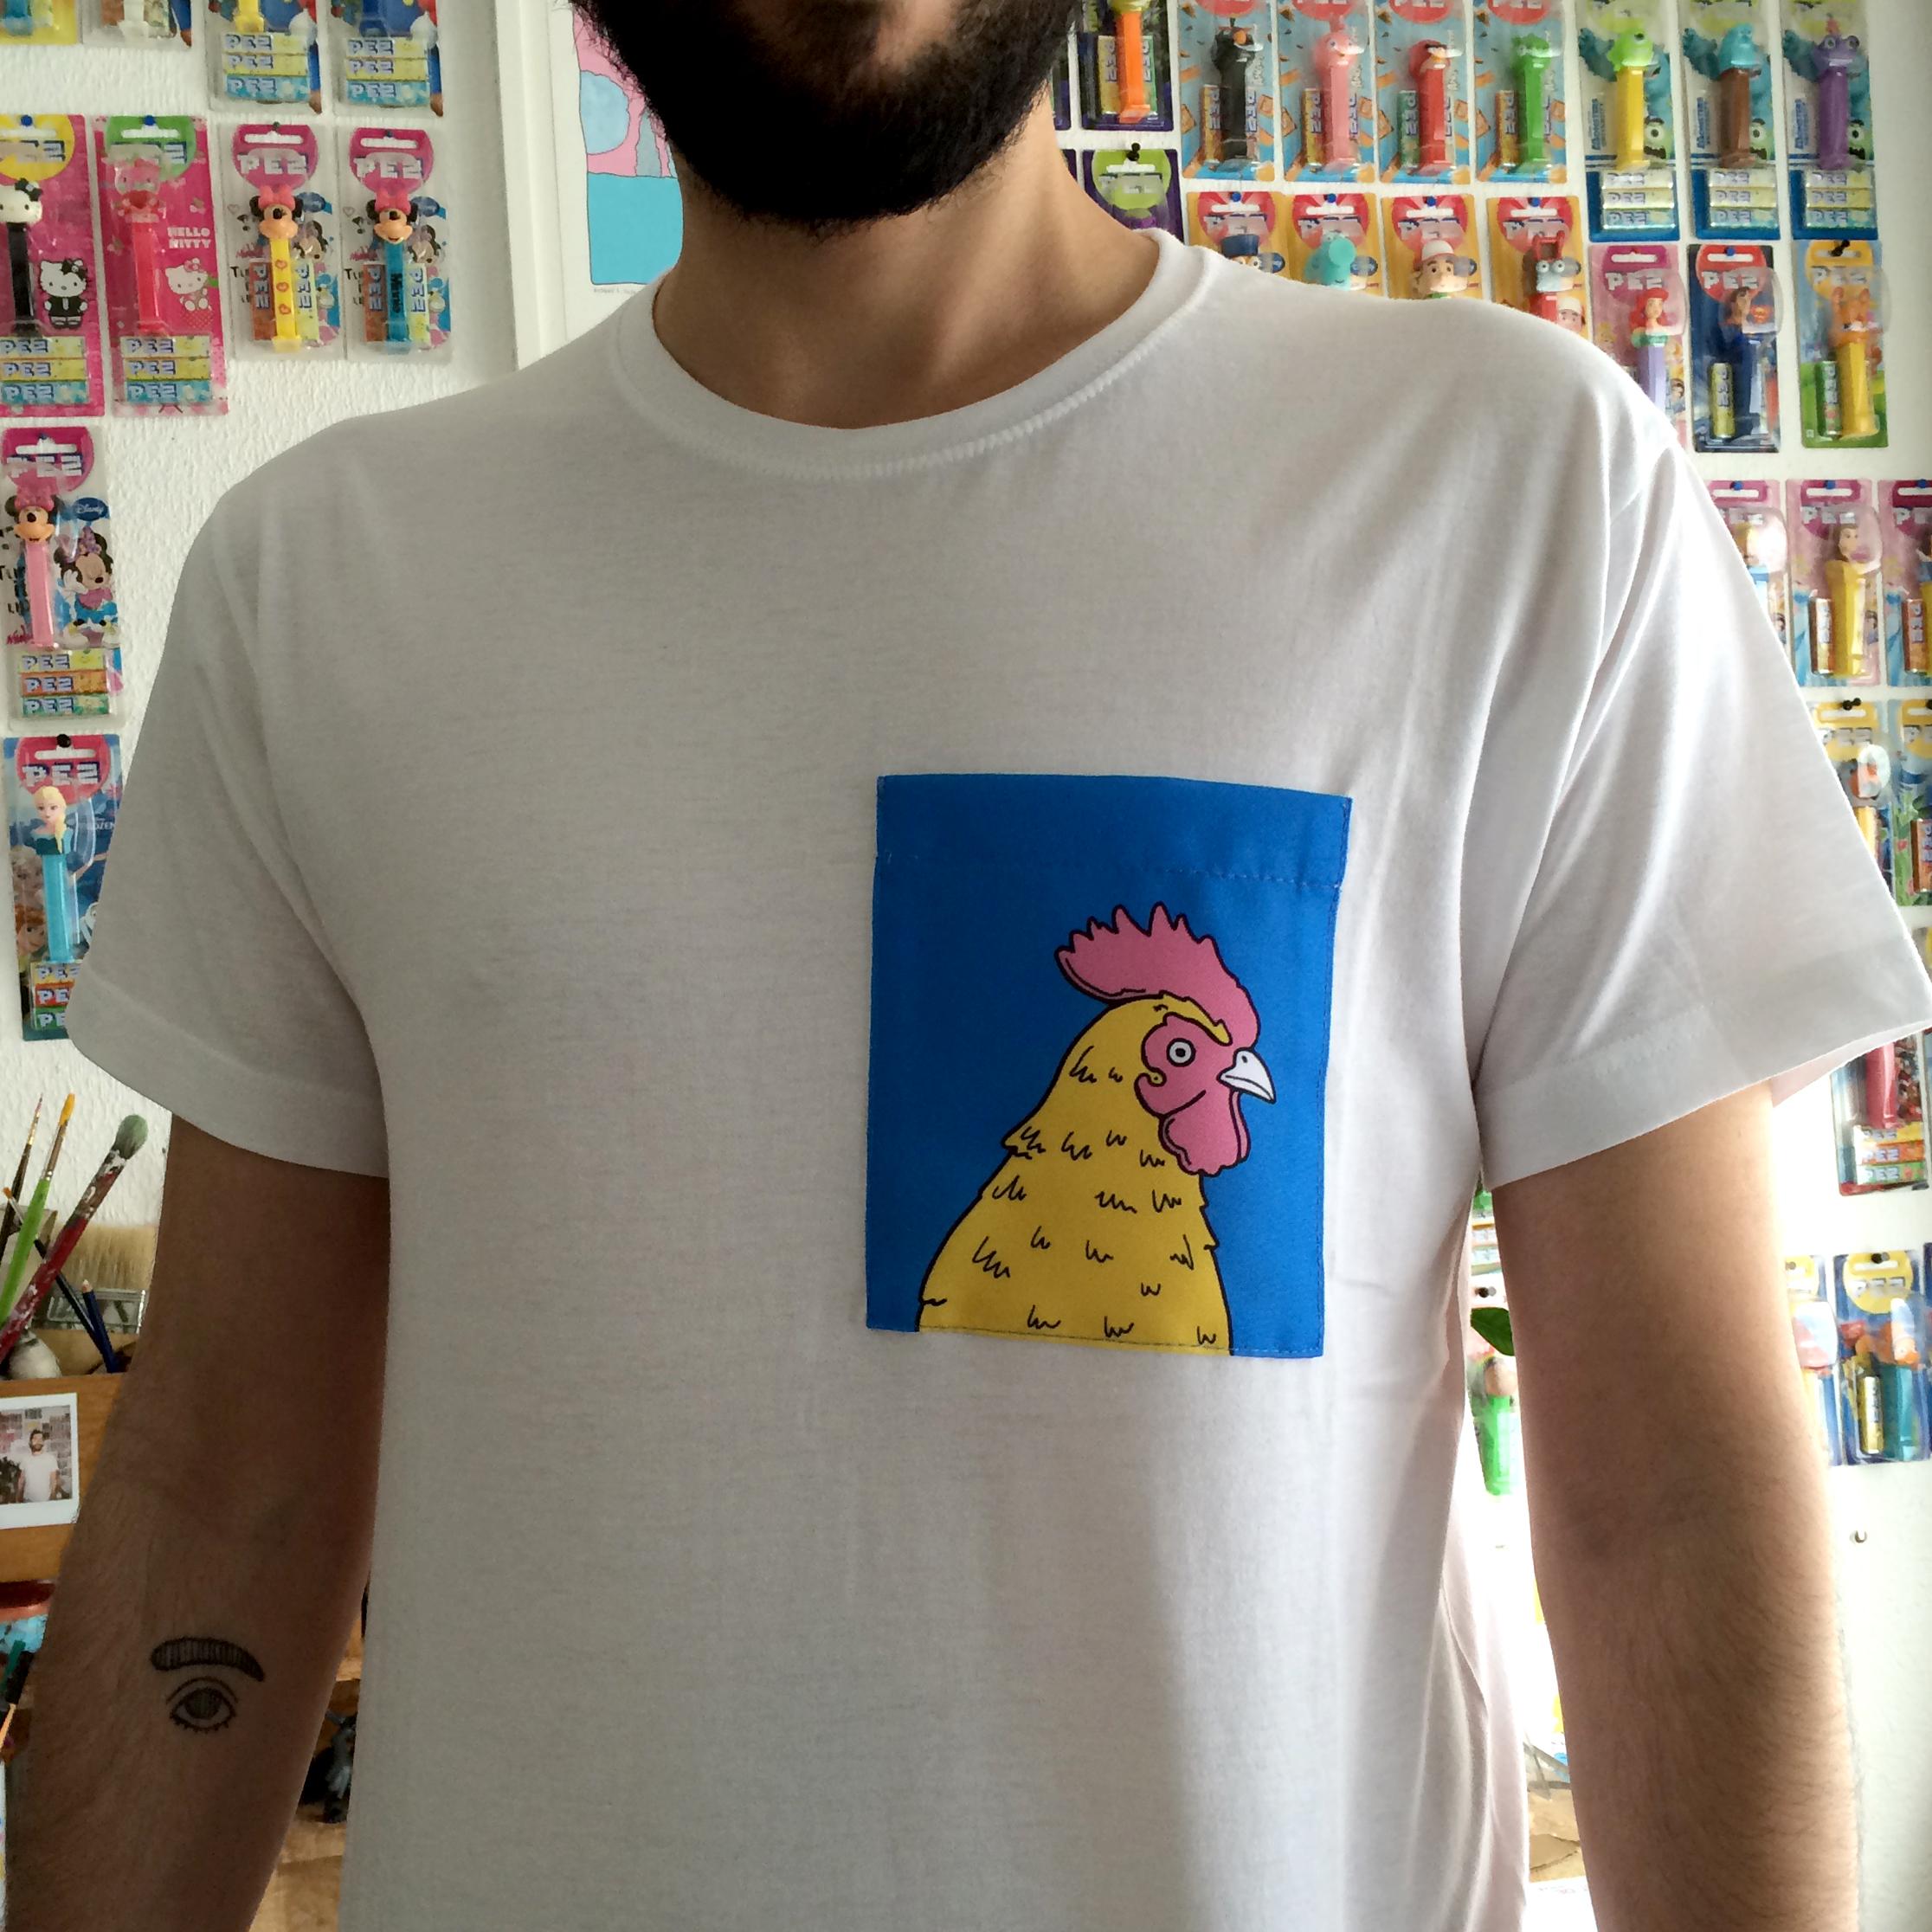 camiseta gallo sanz i vila